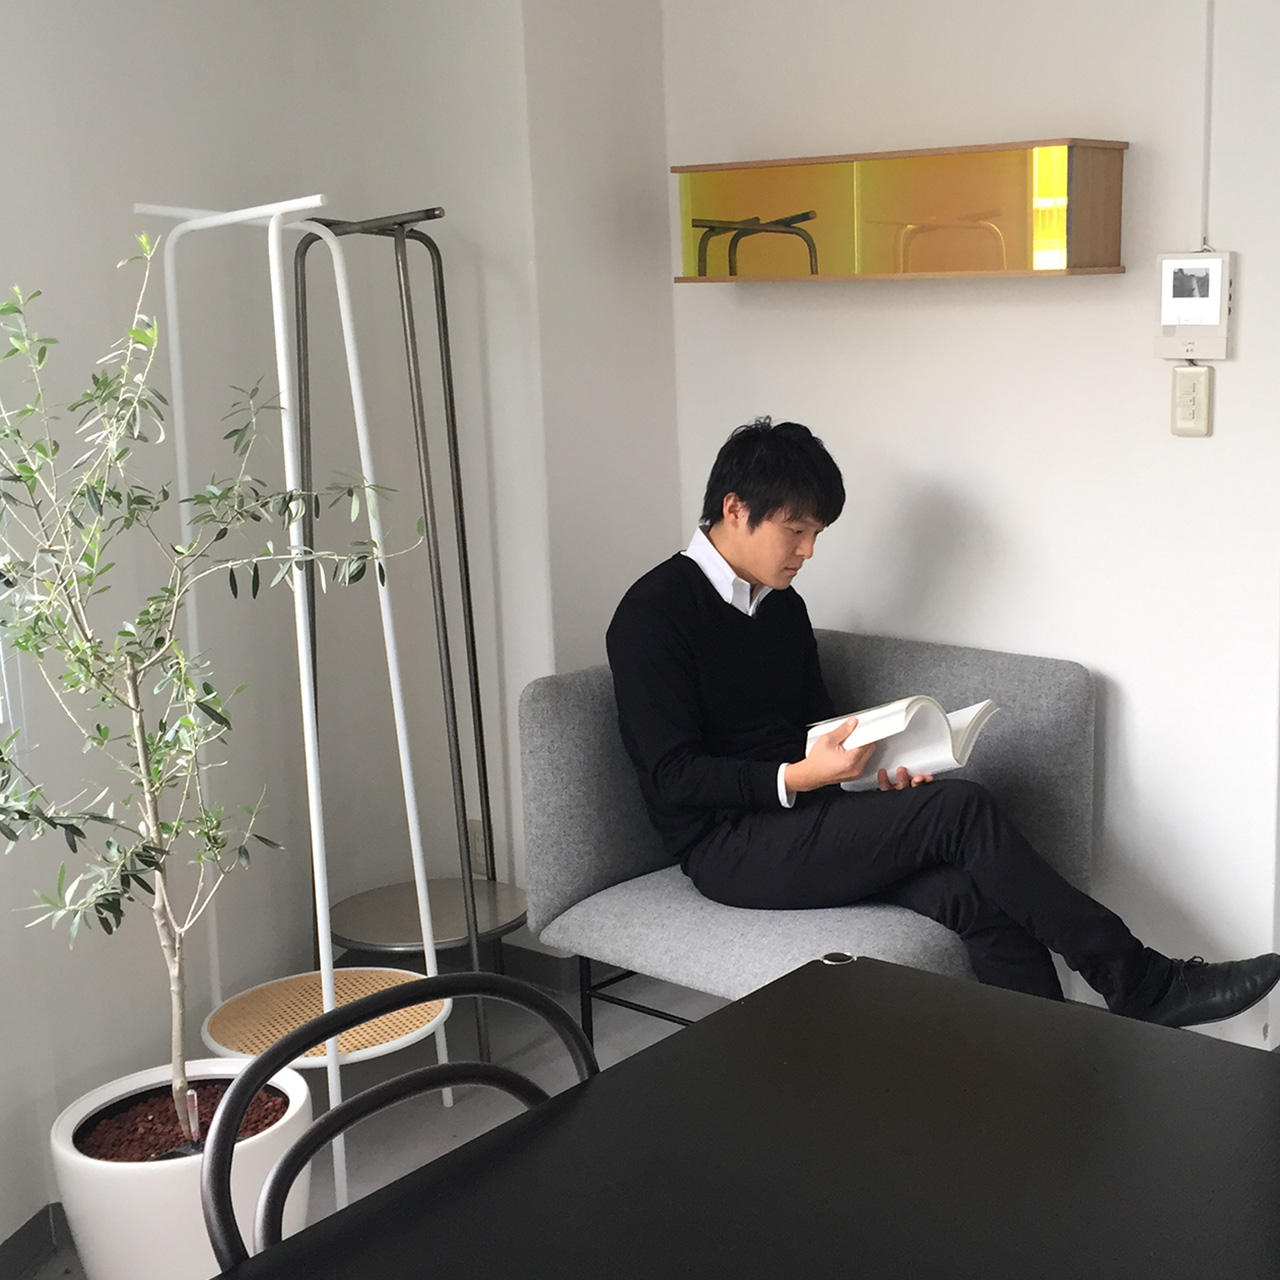 design_milk_design_for_industry_tokyo_001